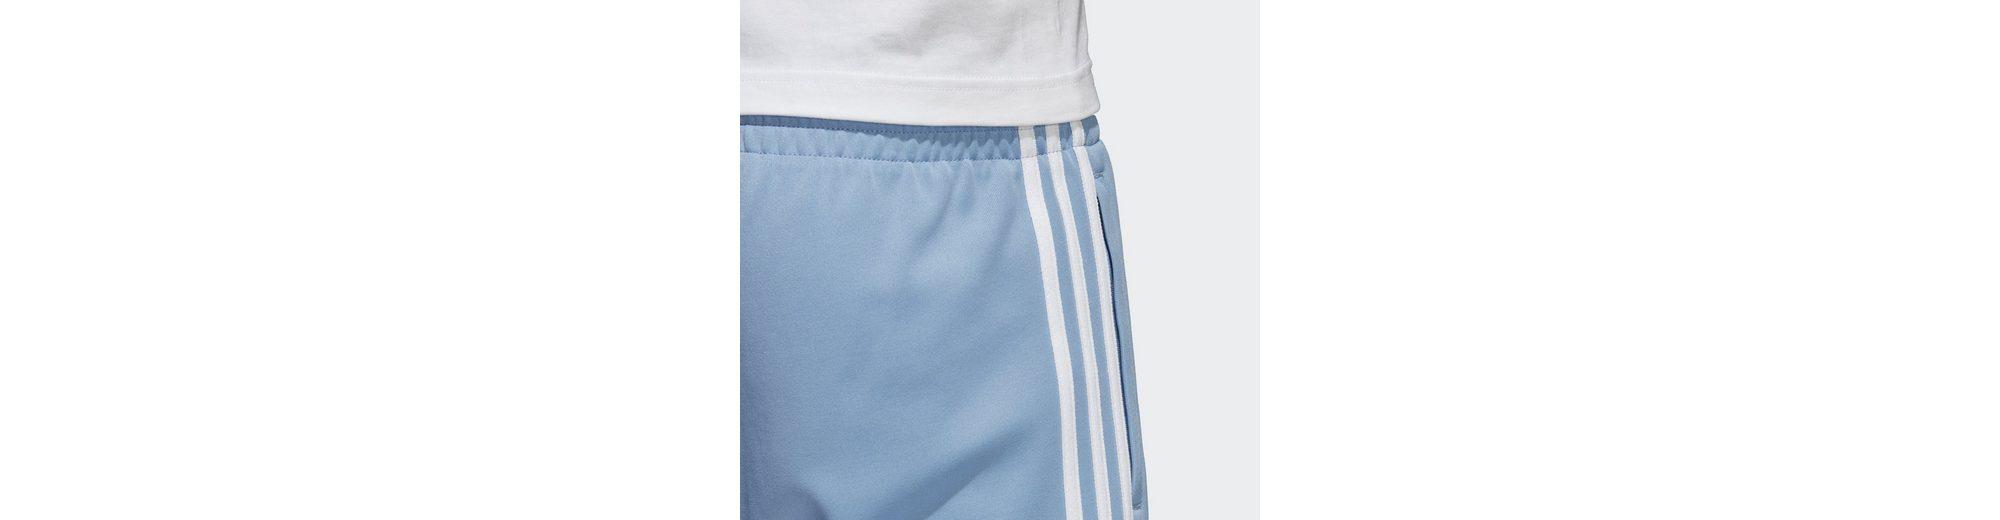 adidas Originals Trainingshose SST Trainingshose Kaufen Sie Günstig Online 67i8YNhp